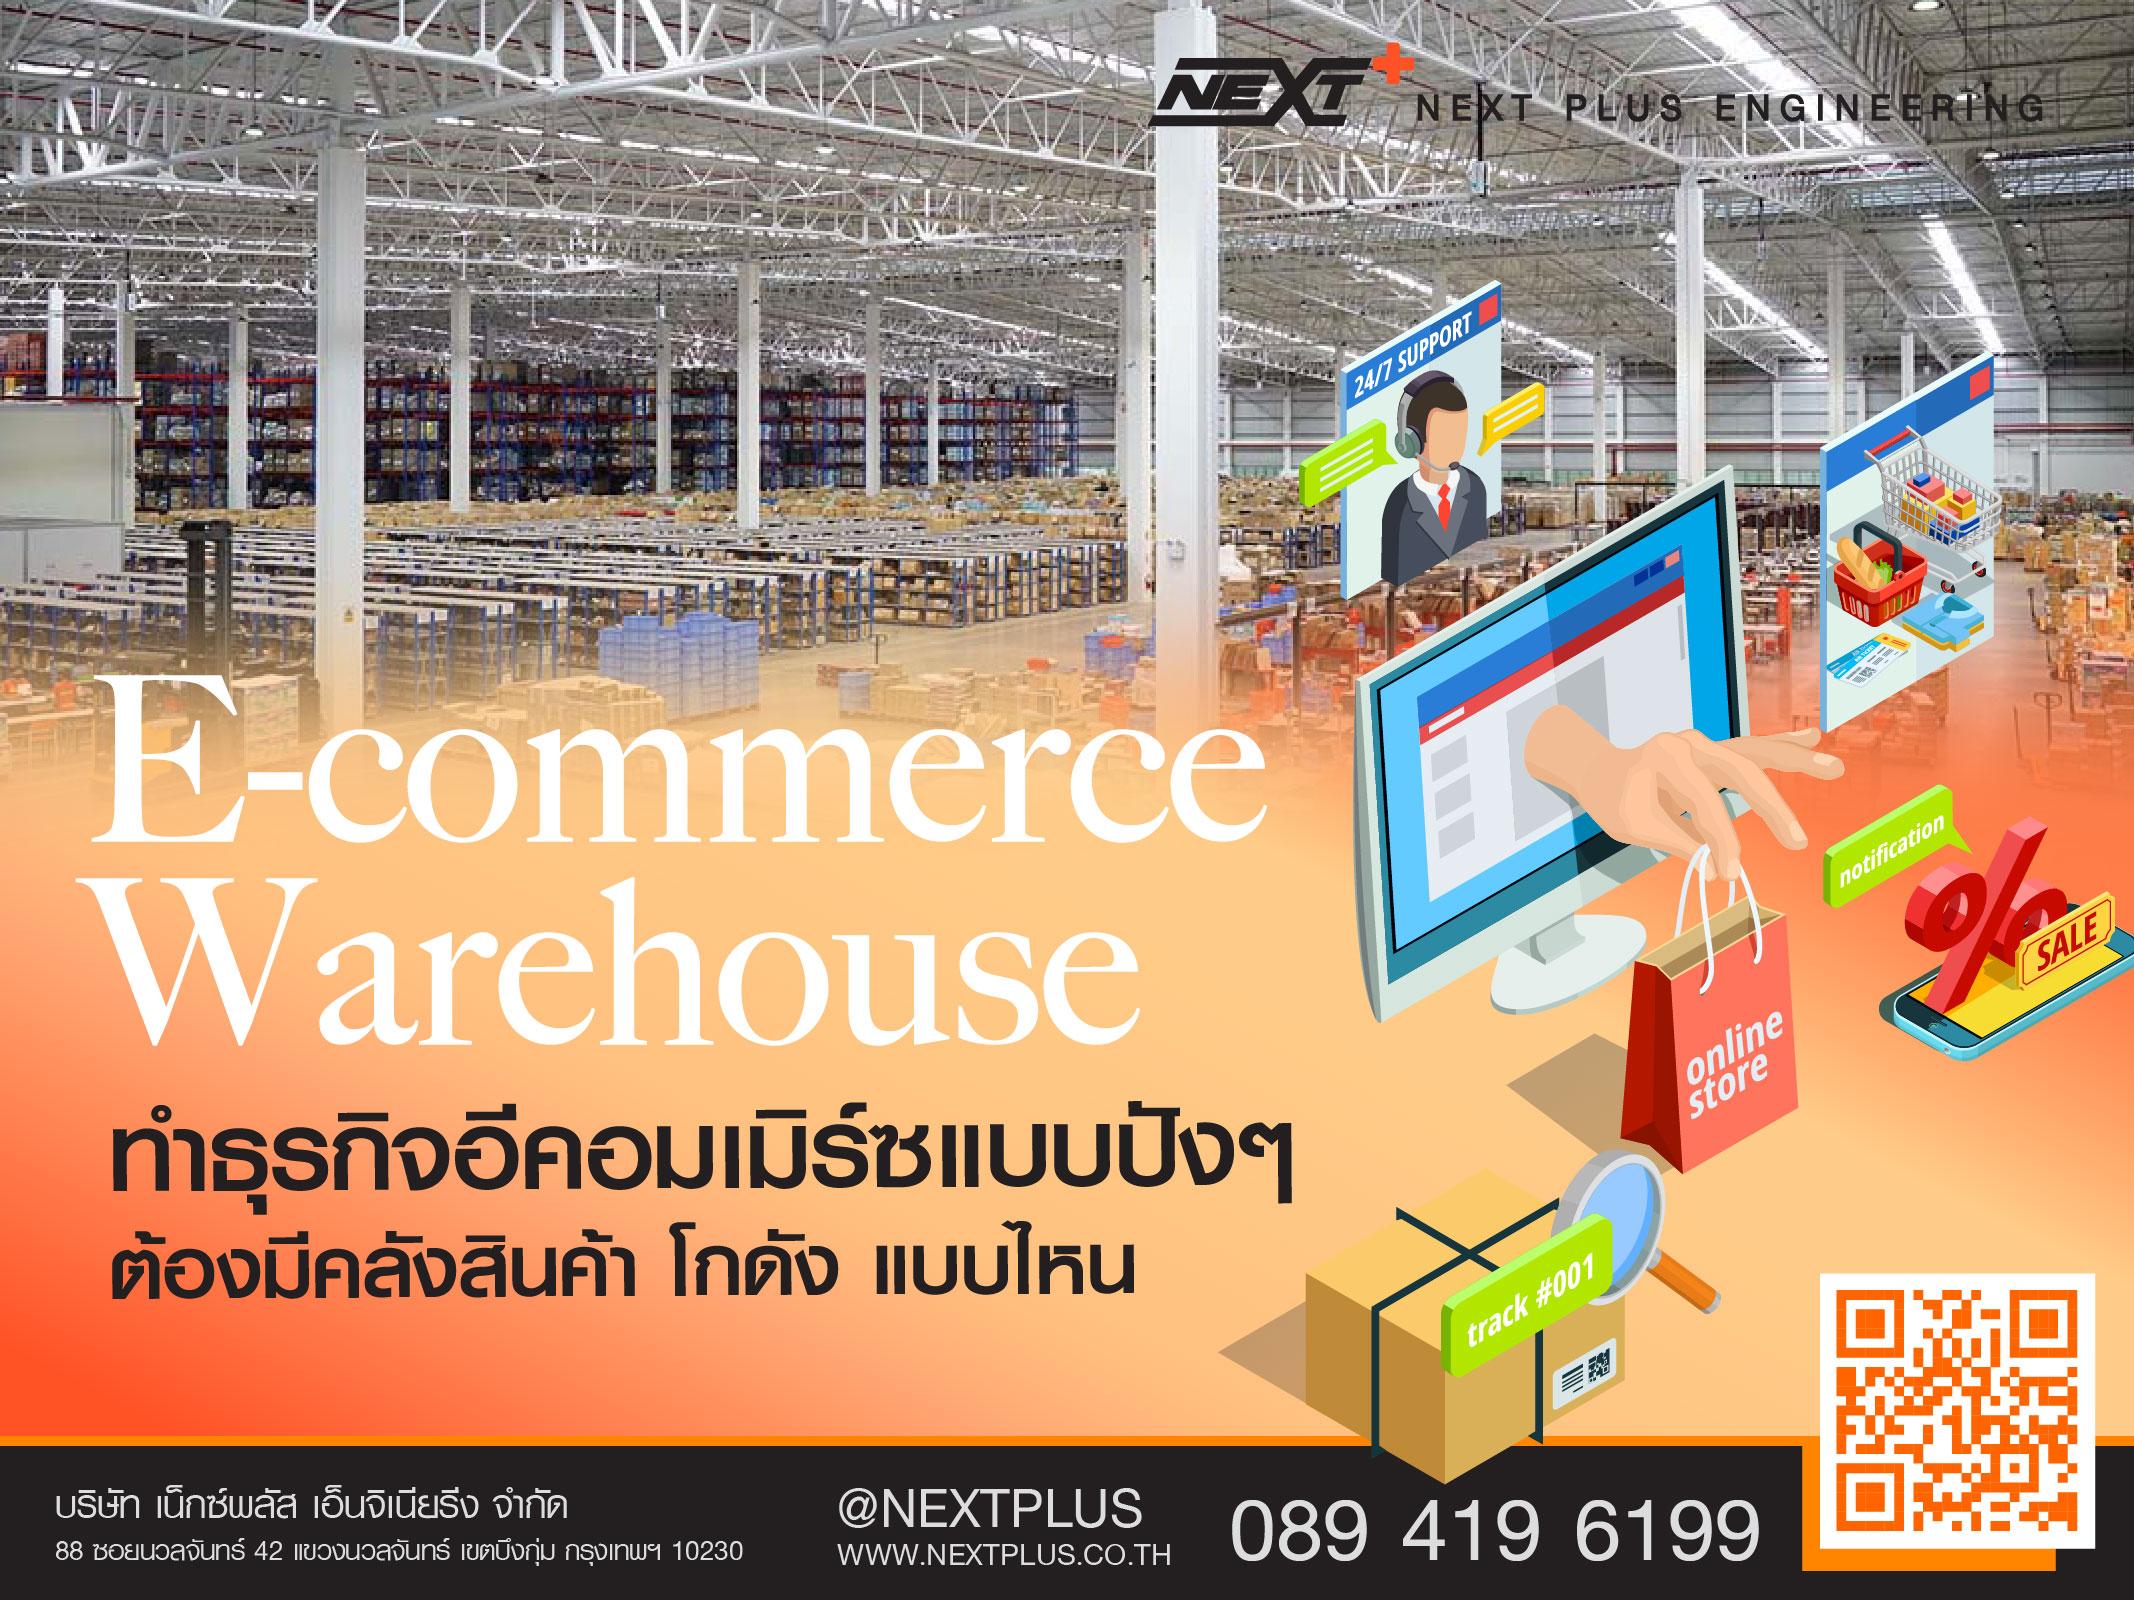 E-commerce Warehouse -next plus-01